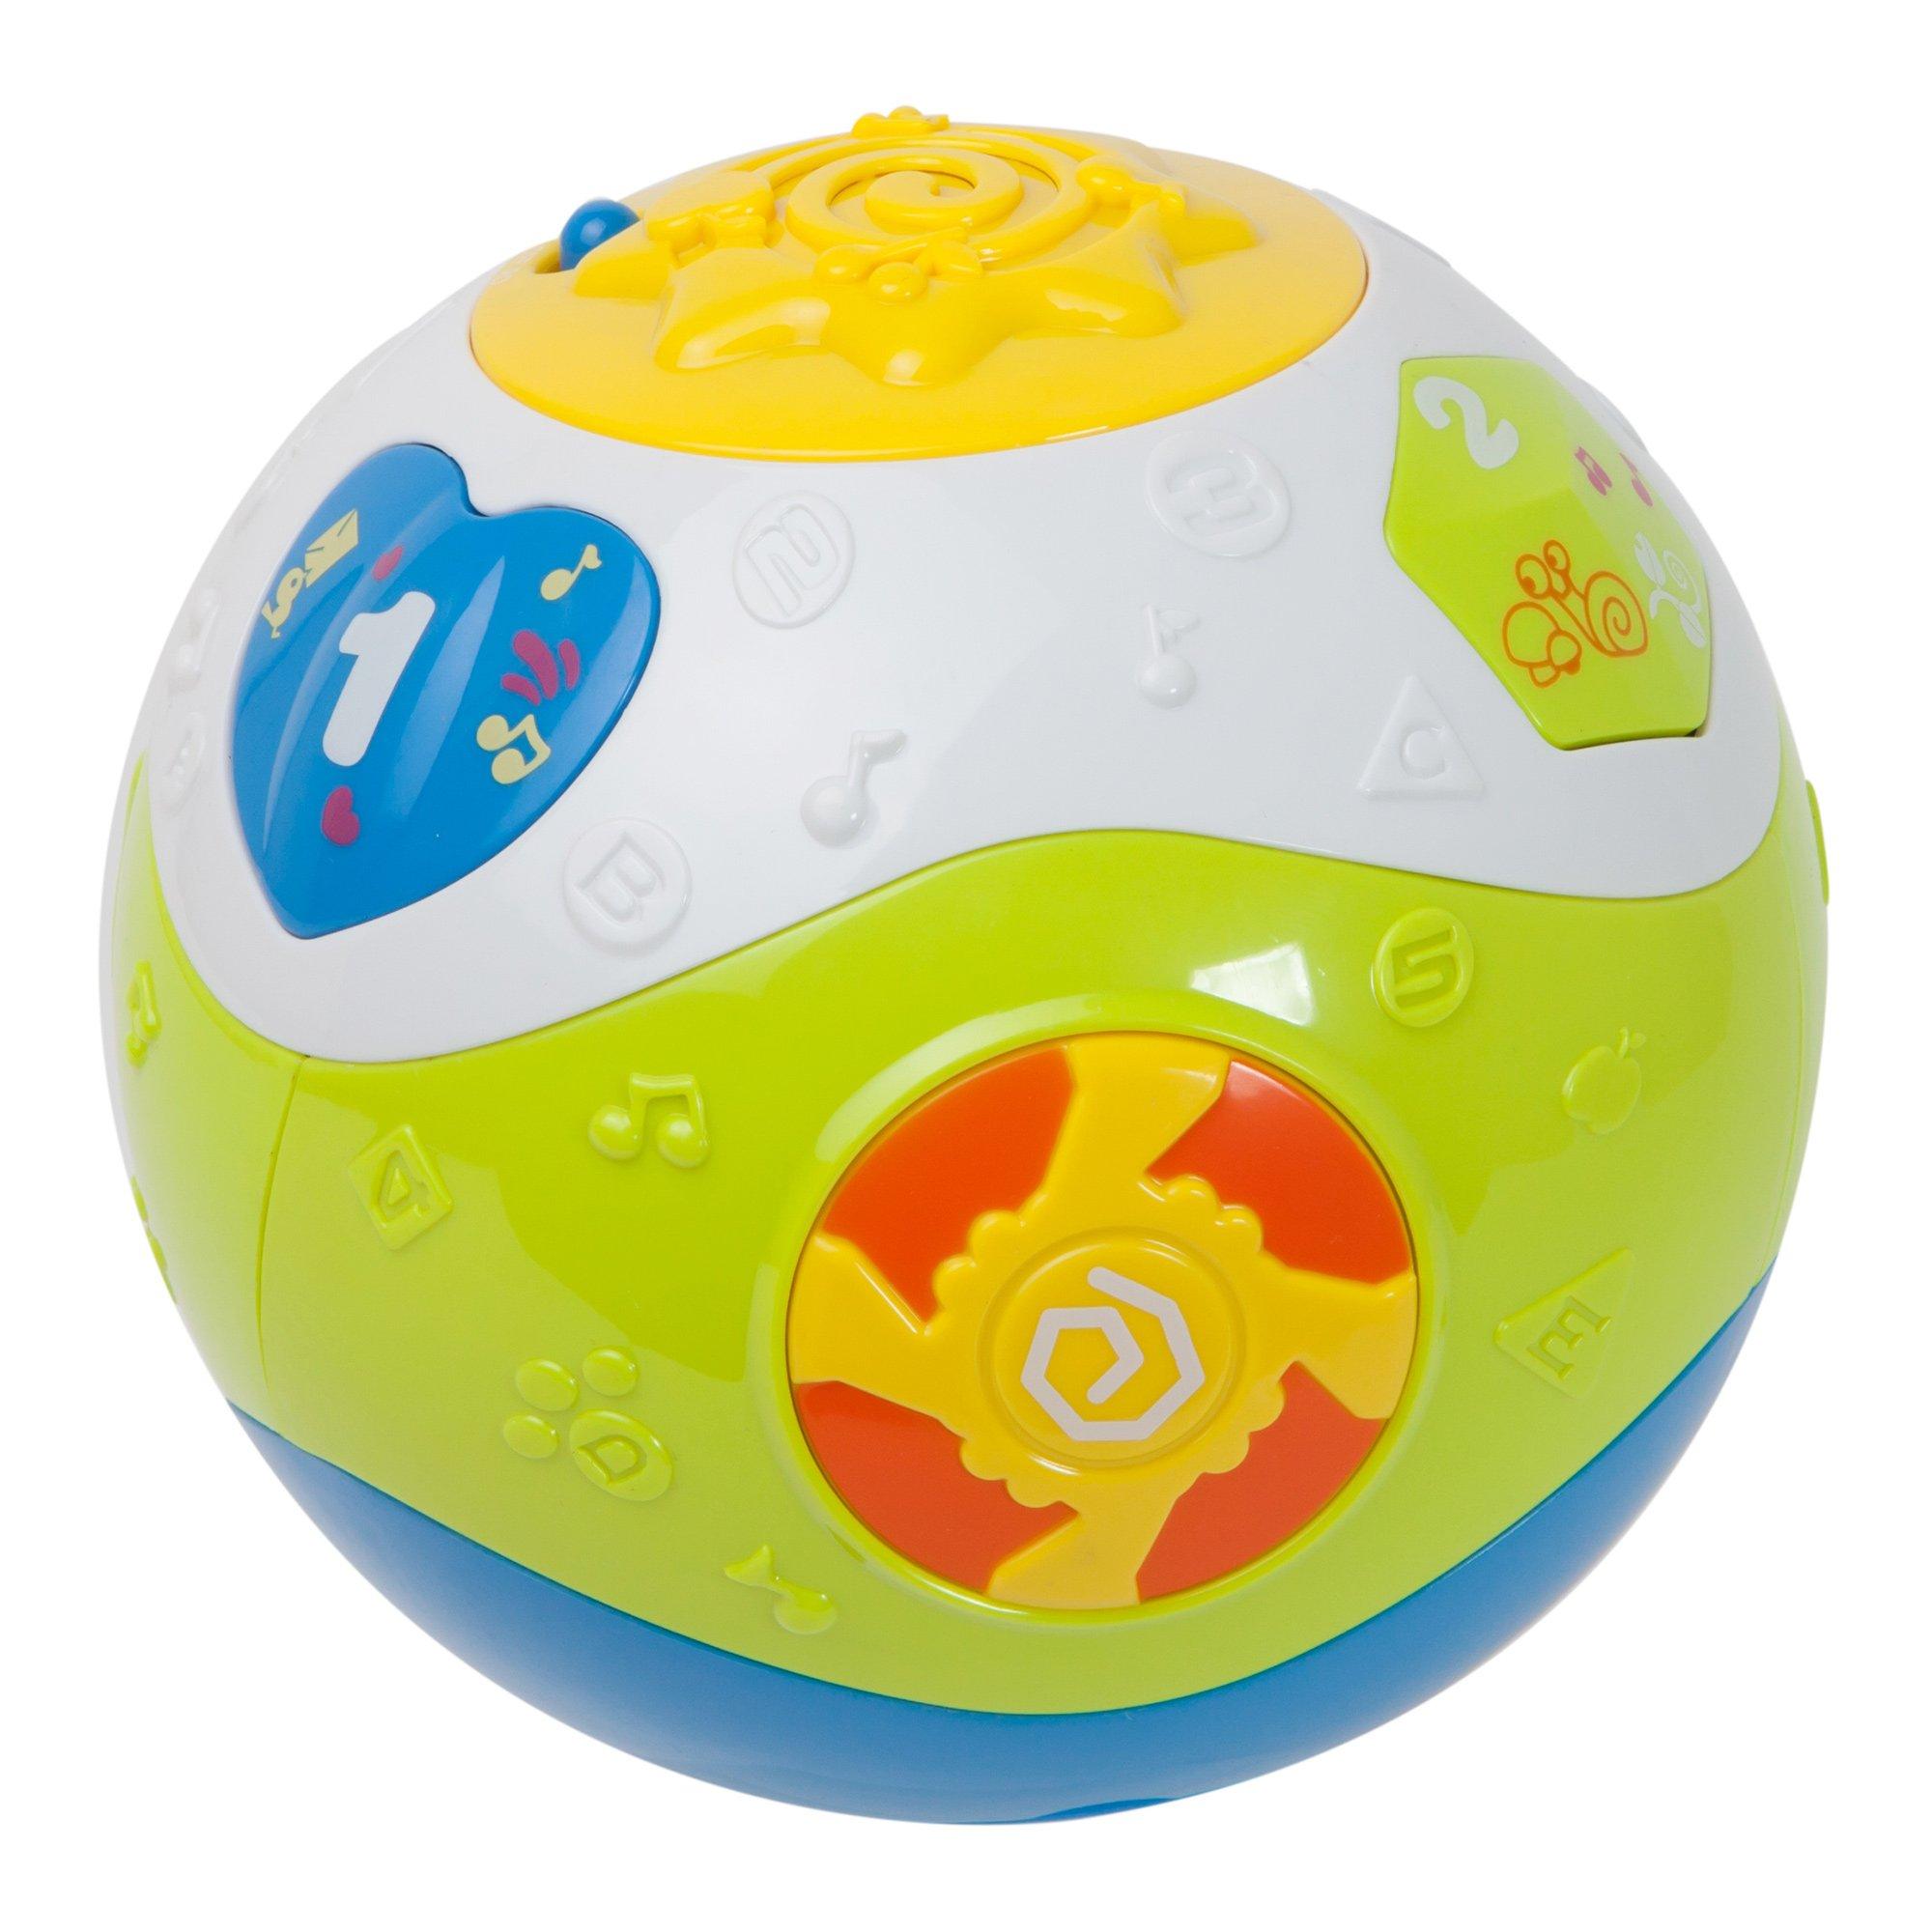 jucarie bebelusi noriel bebe - minge cu activitati